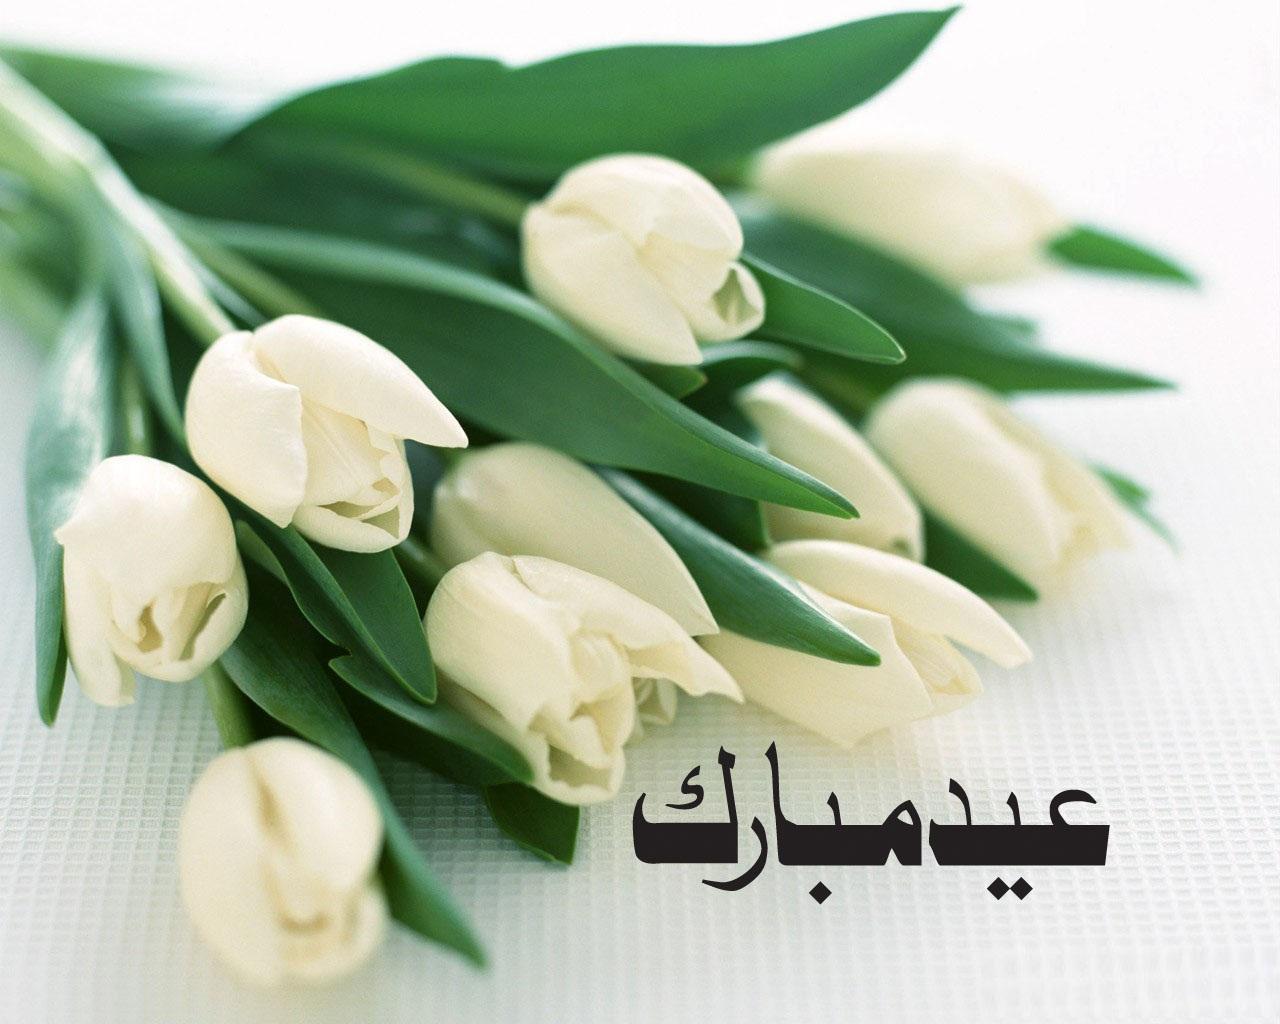 Eid mubarak cards free download 091413 free download photos of eid mubarak greeting card kristyandbryce Choice Image